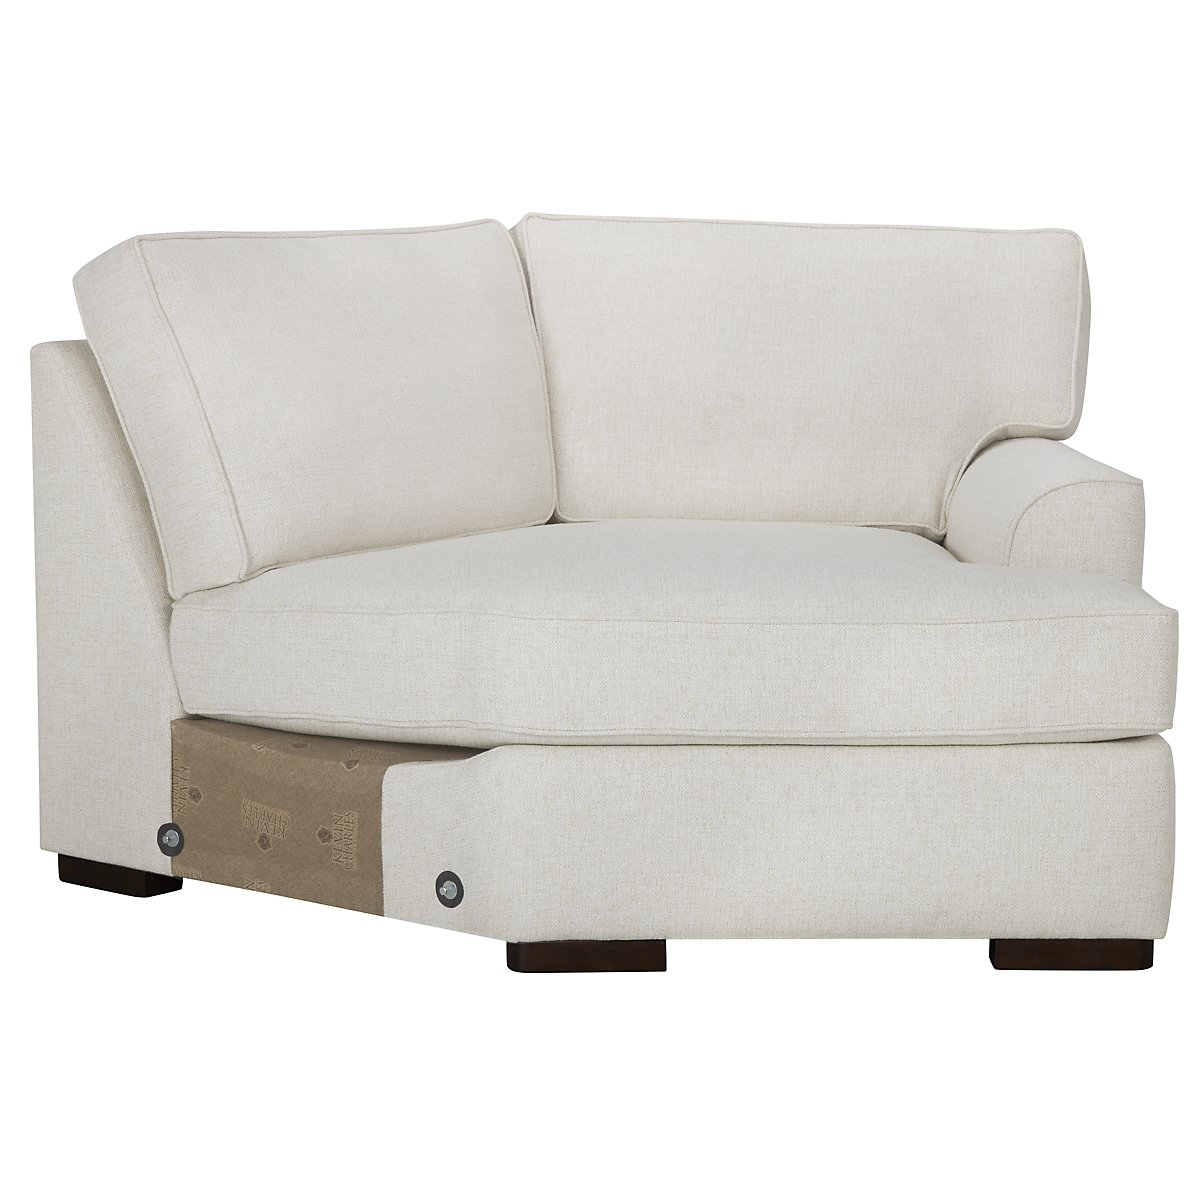 City Furniture: Austin White Fabric Dual Cuddler Sectional